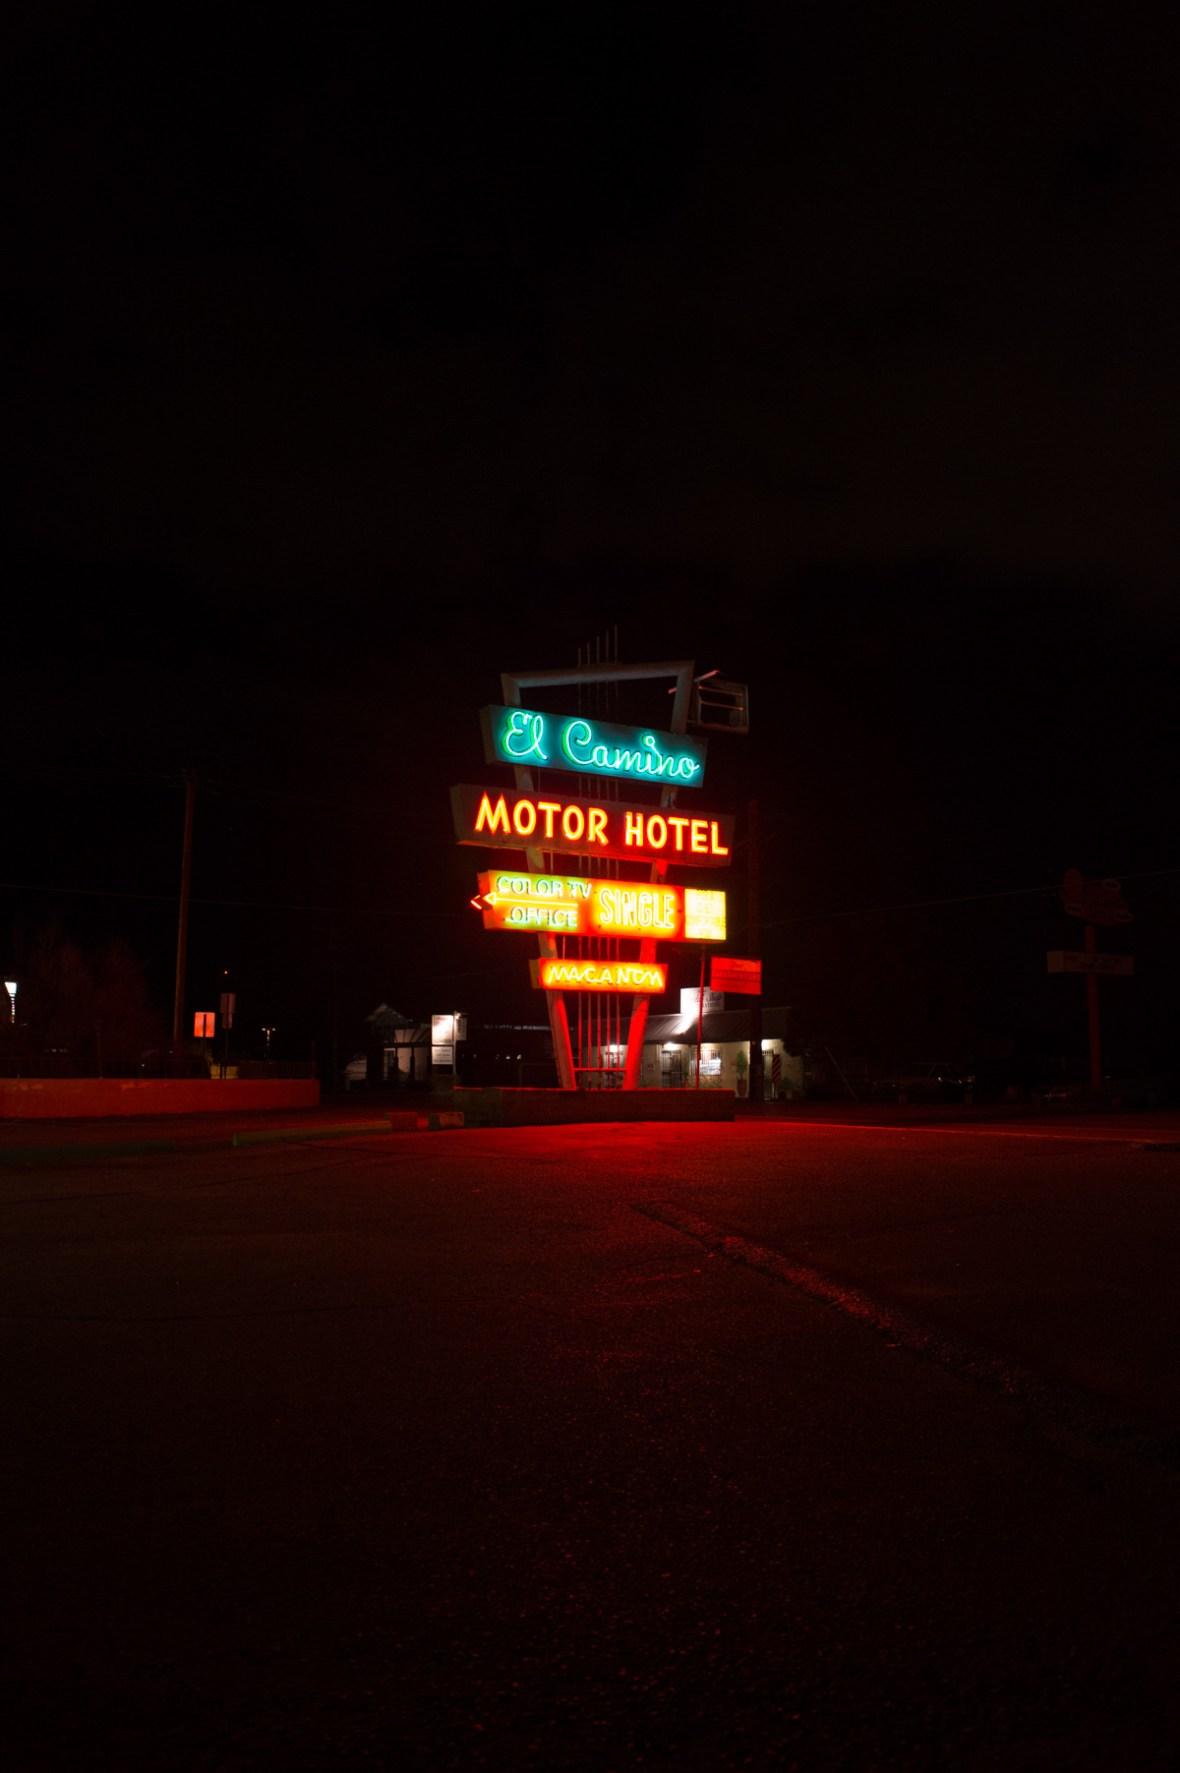 El Camino Motor Hotel - 6801 4th Street NW, Albuquerque, New Mexico U.S.A. - 2015